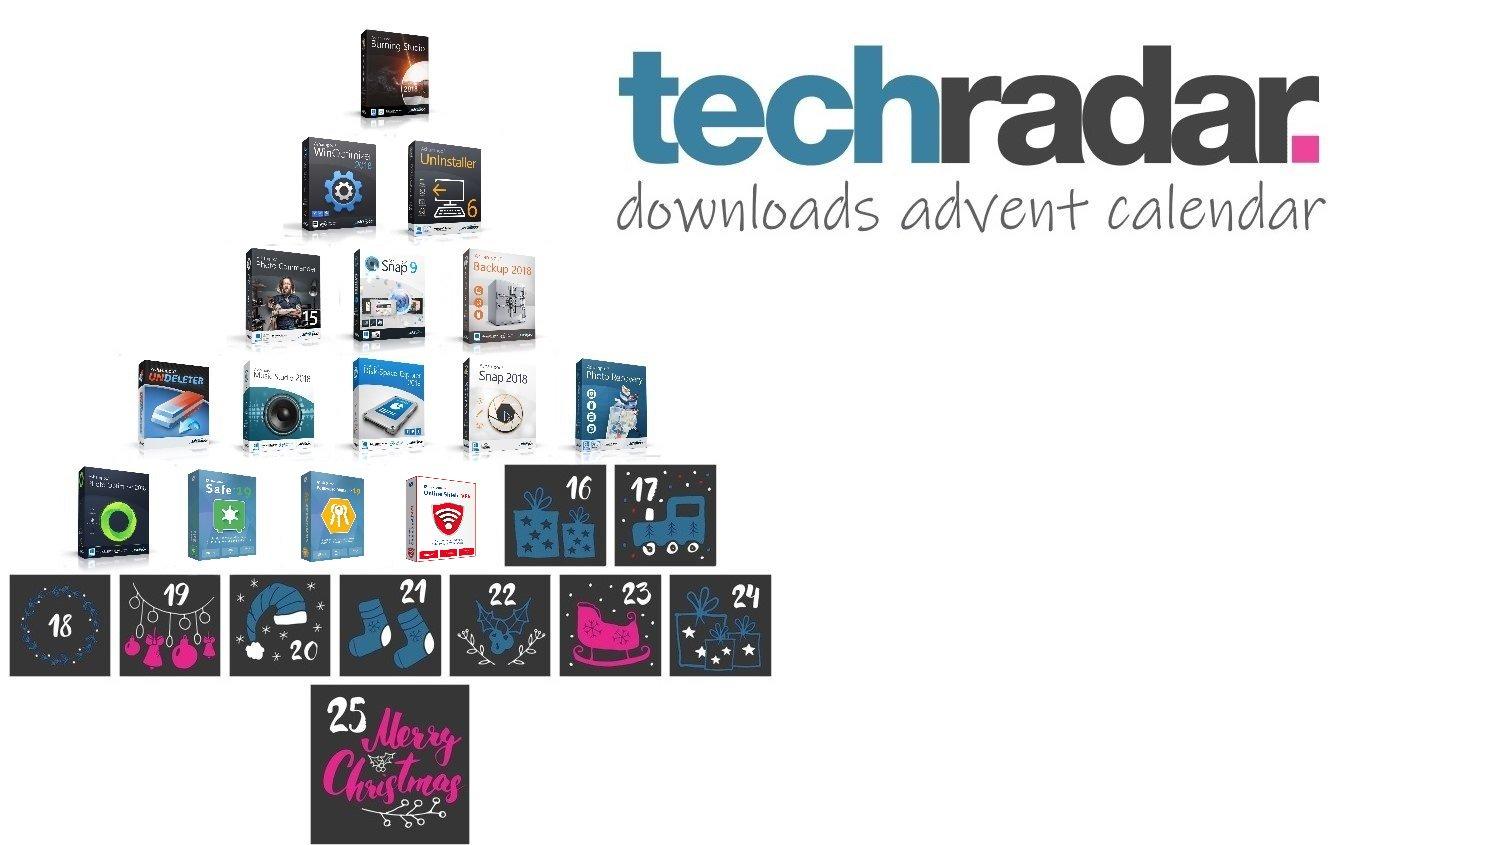 TechRadar's downloads advent calendar: get mySteganos Online Shield VPN free